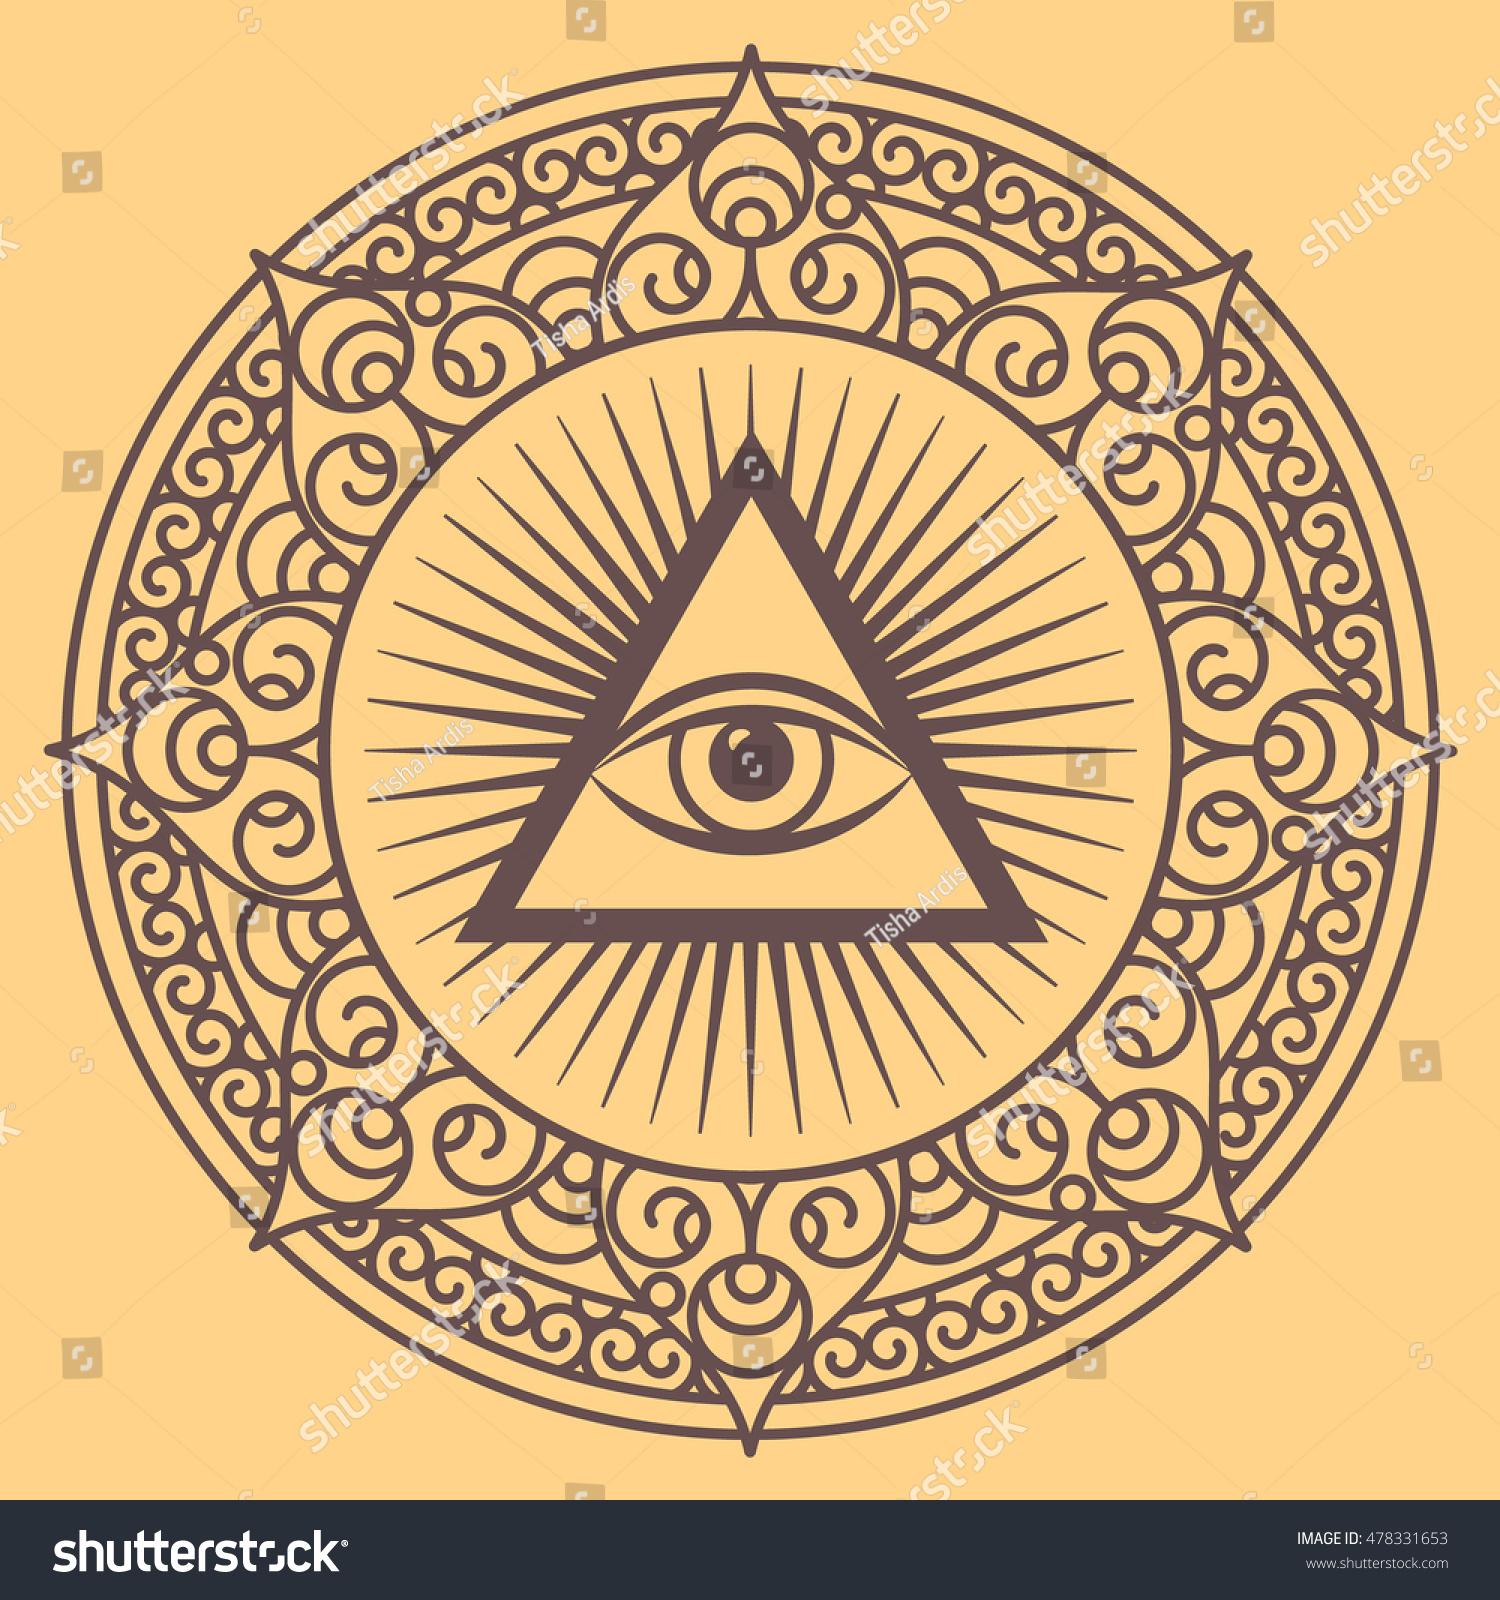 vector illustration occult sign third eye stock vector